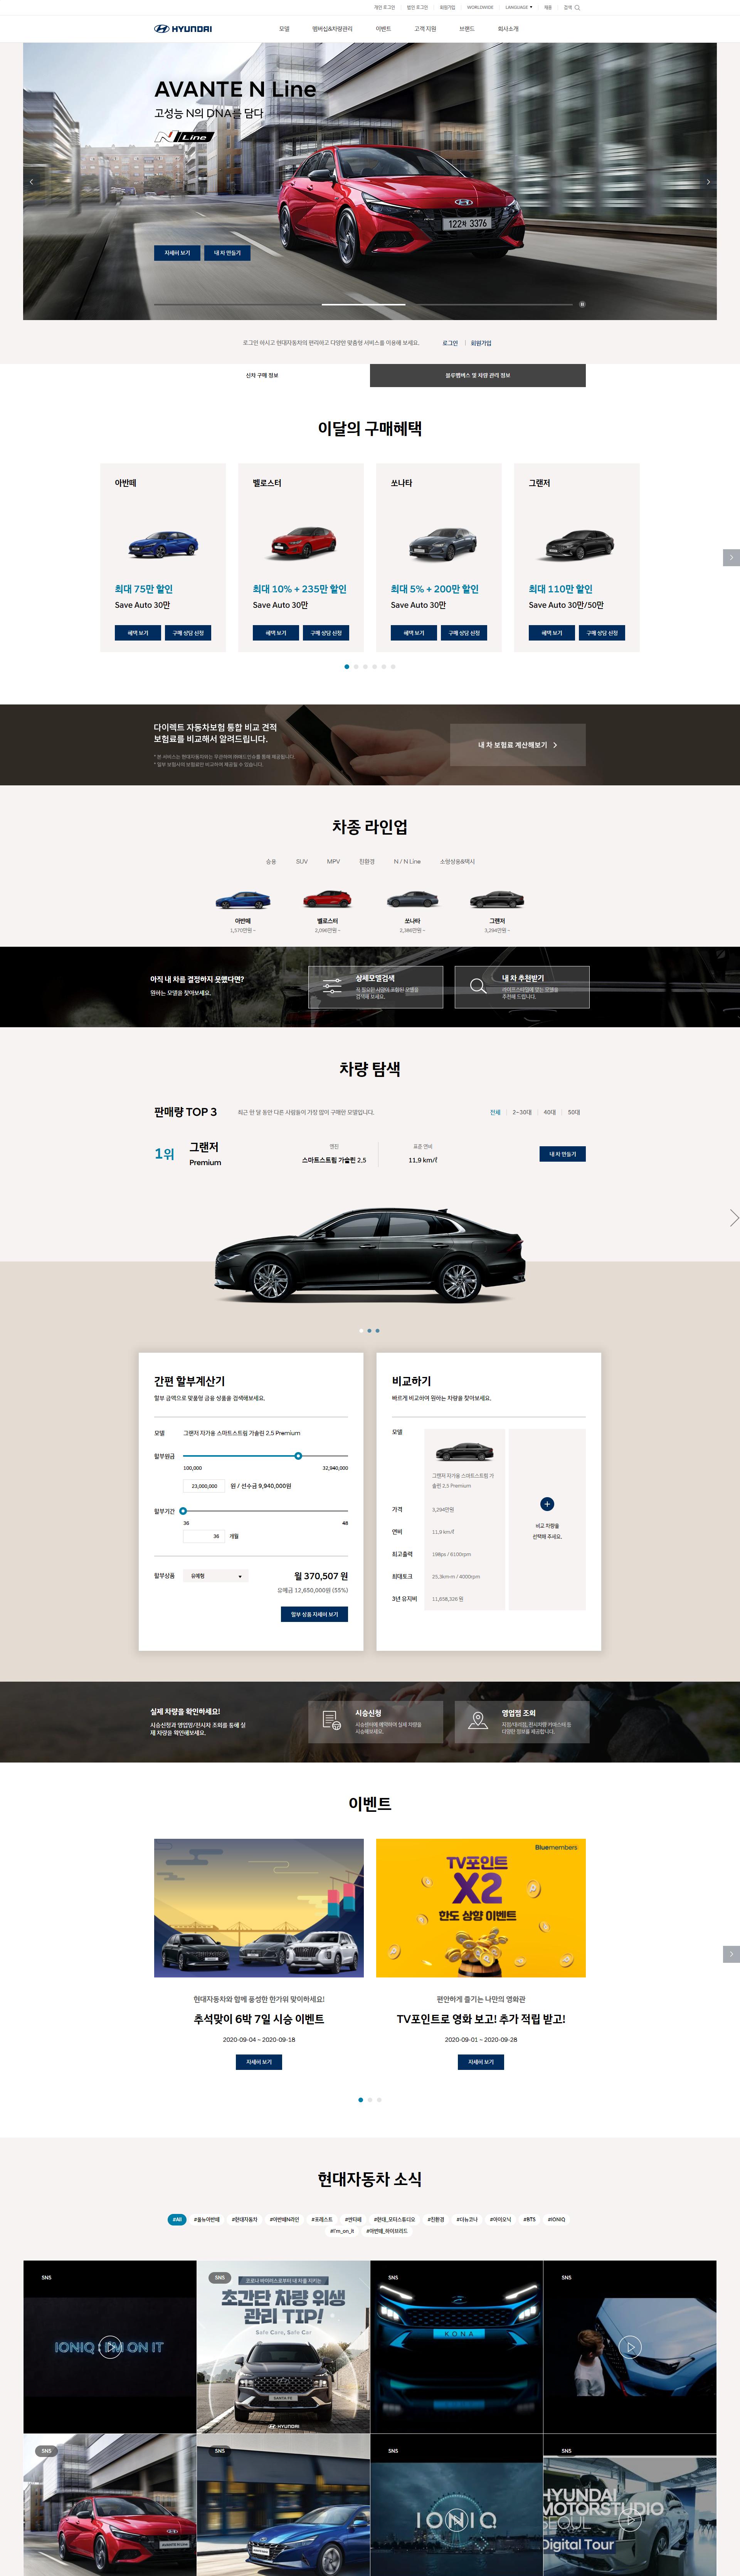 Web Ui에 있는 가영 이님의 핀 2020 주유소 차량 금융